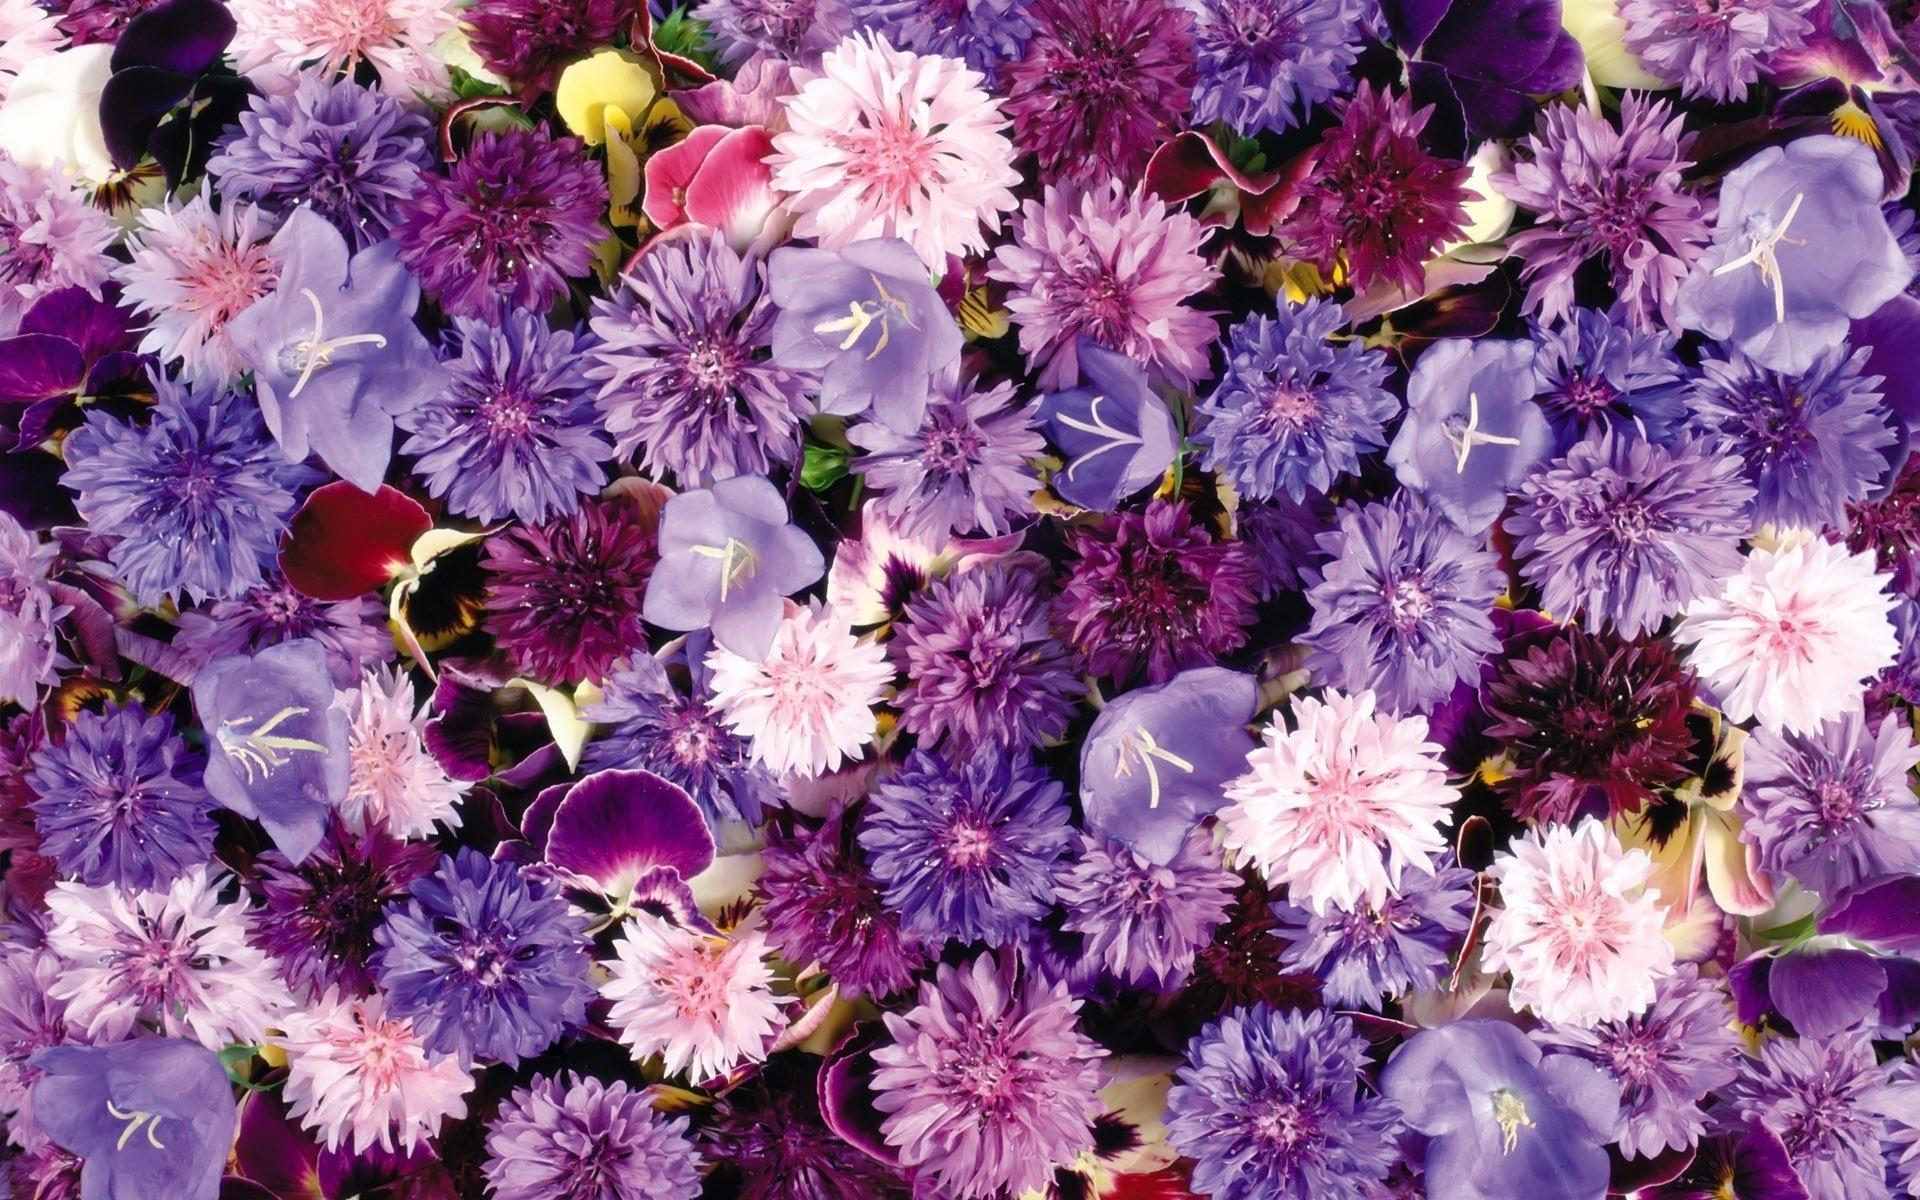 Fiori Wallpaper.Flower Hd Wallpaper Background Image 1920x1200 Id 374934